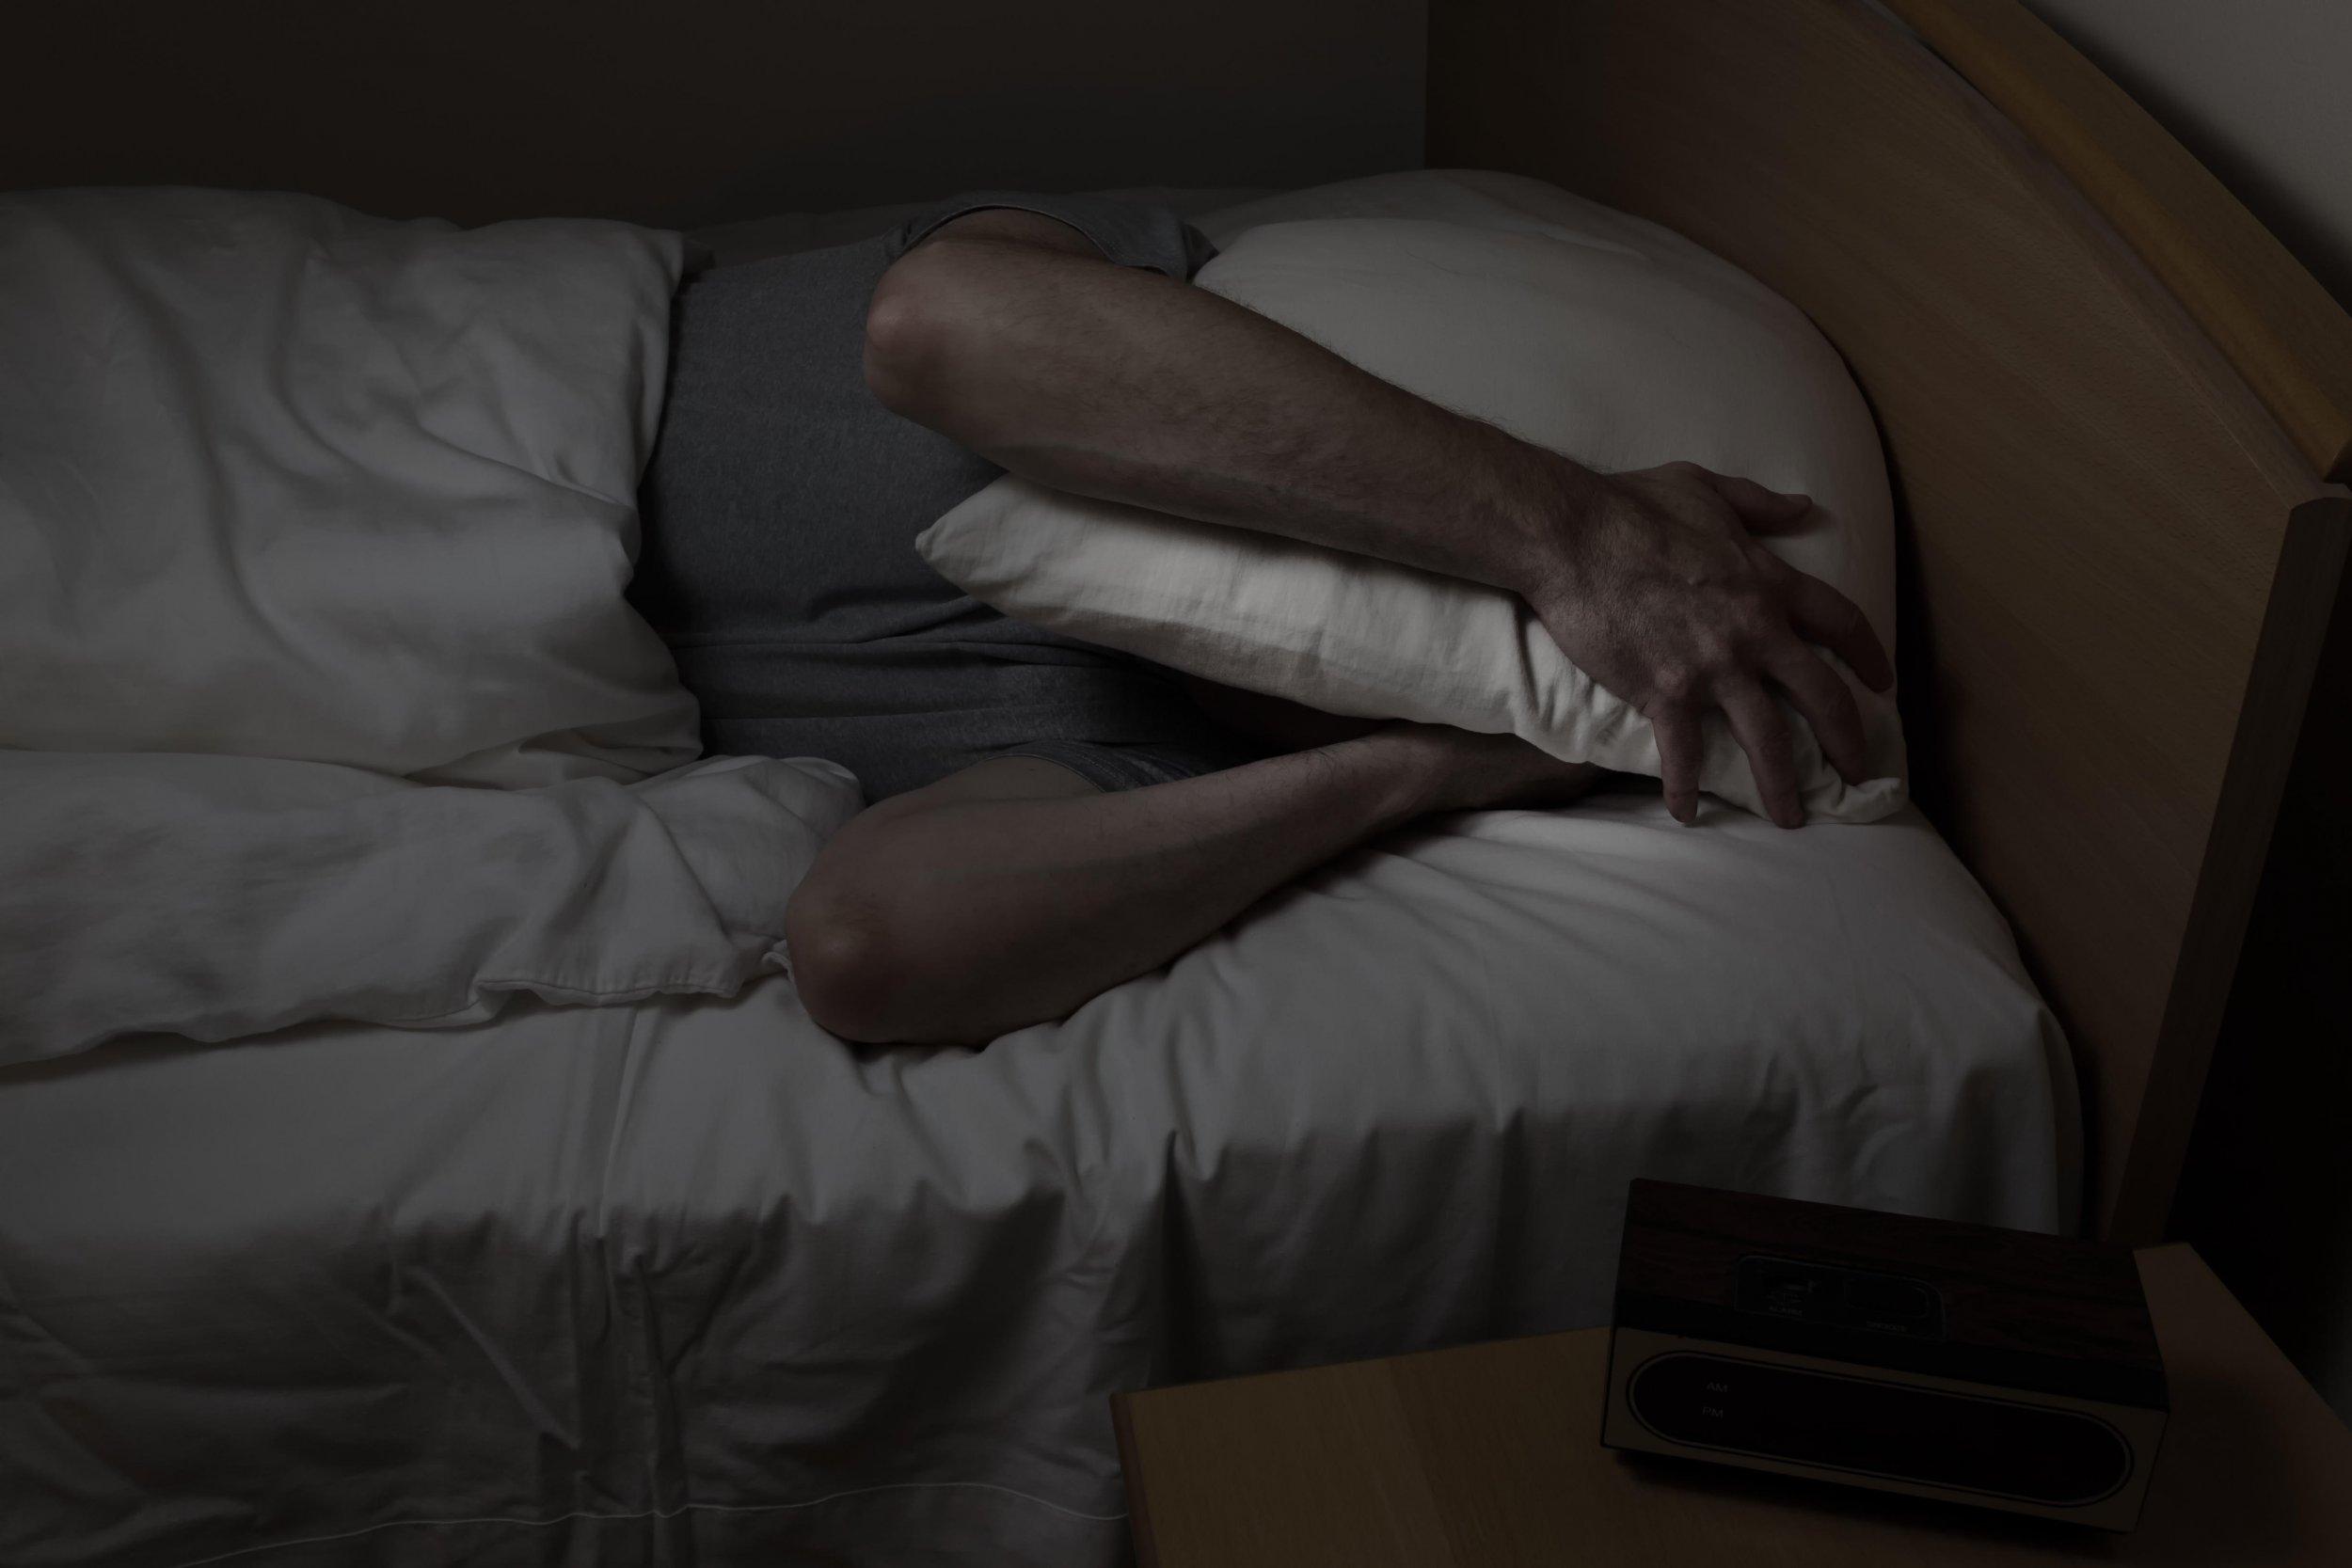 04_17_Sleep_01